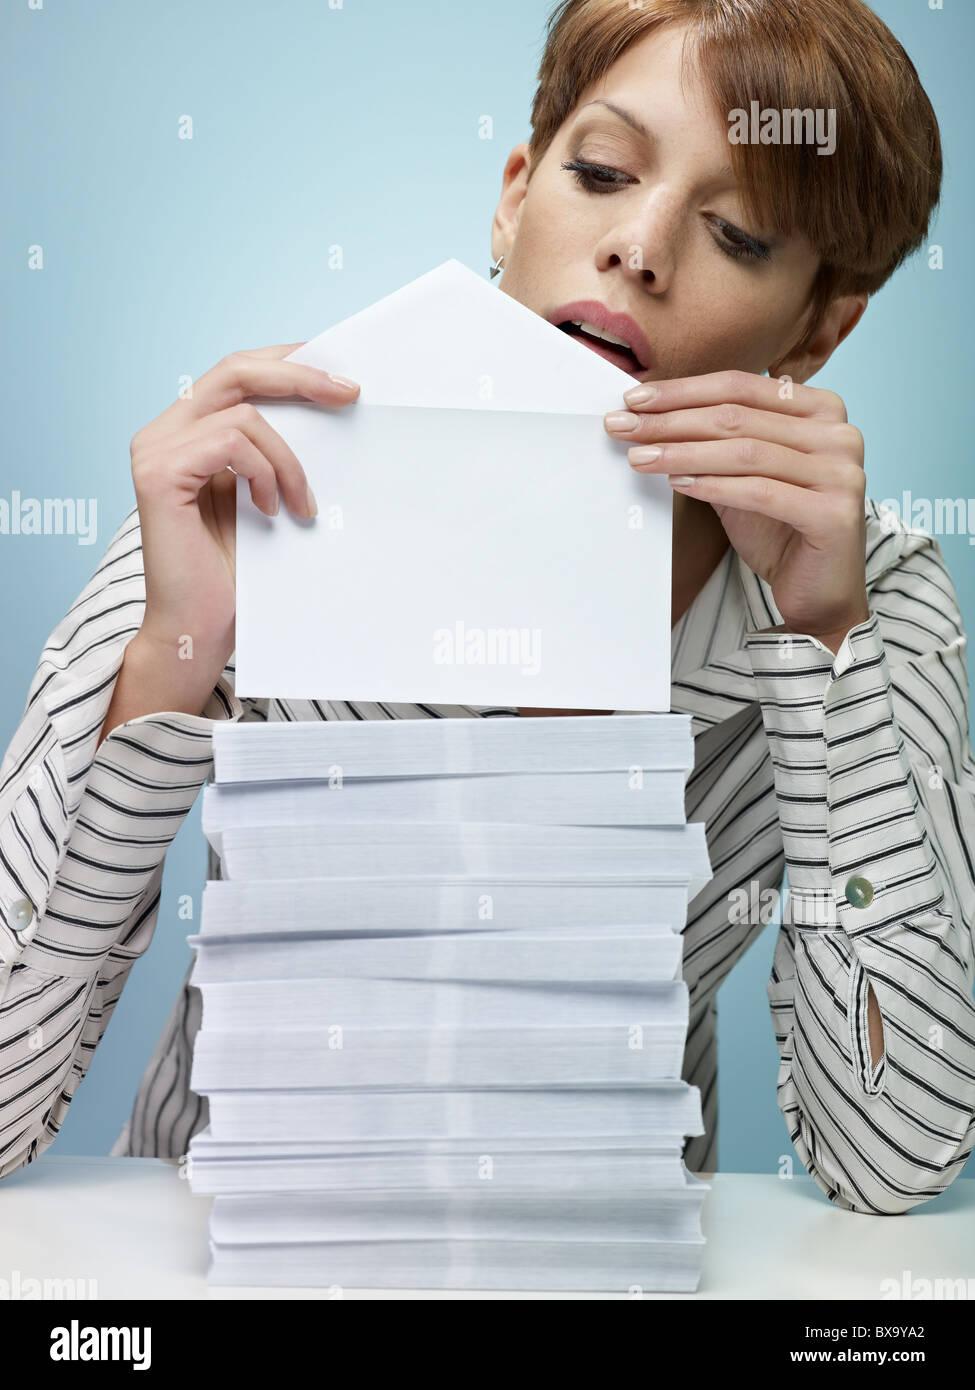 caucasian secretary closing pile of envelopes. Vertical shape, front view, waist up, copy space - Stock Image